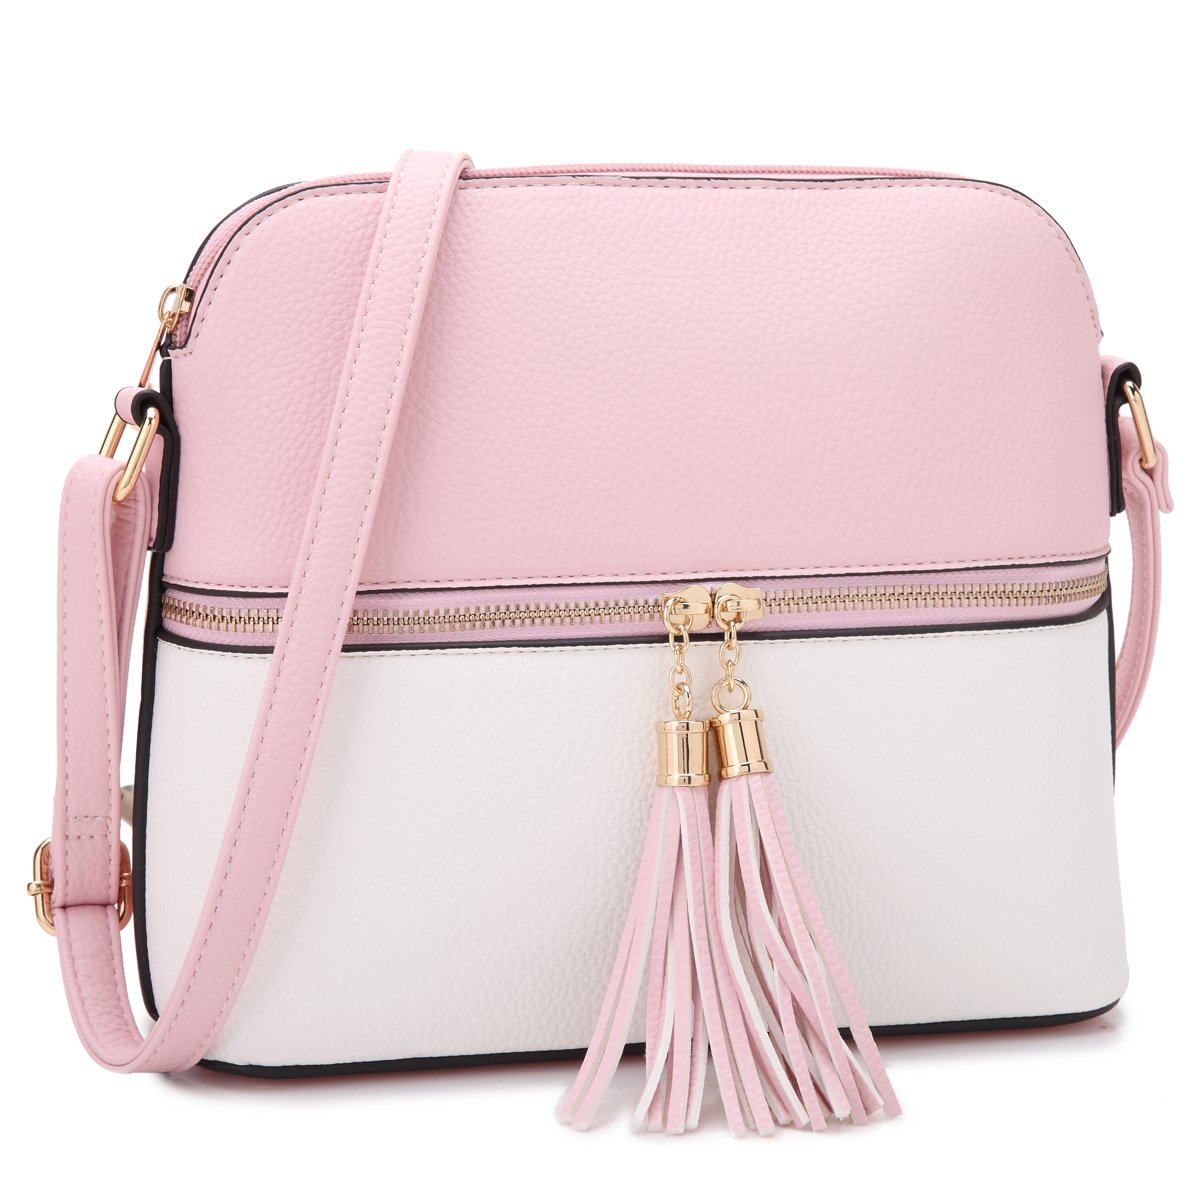 MKP Collection Woman's Crossbody Bag Multi Zipper Travel Shoulder Messenger Purse~Tassel Accent Medium Crossbody Bag~Lightweight Fashion Medium Crossbody Bag with Tassel for all season~ (7660 PK/WT)